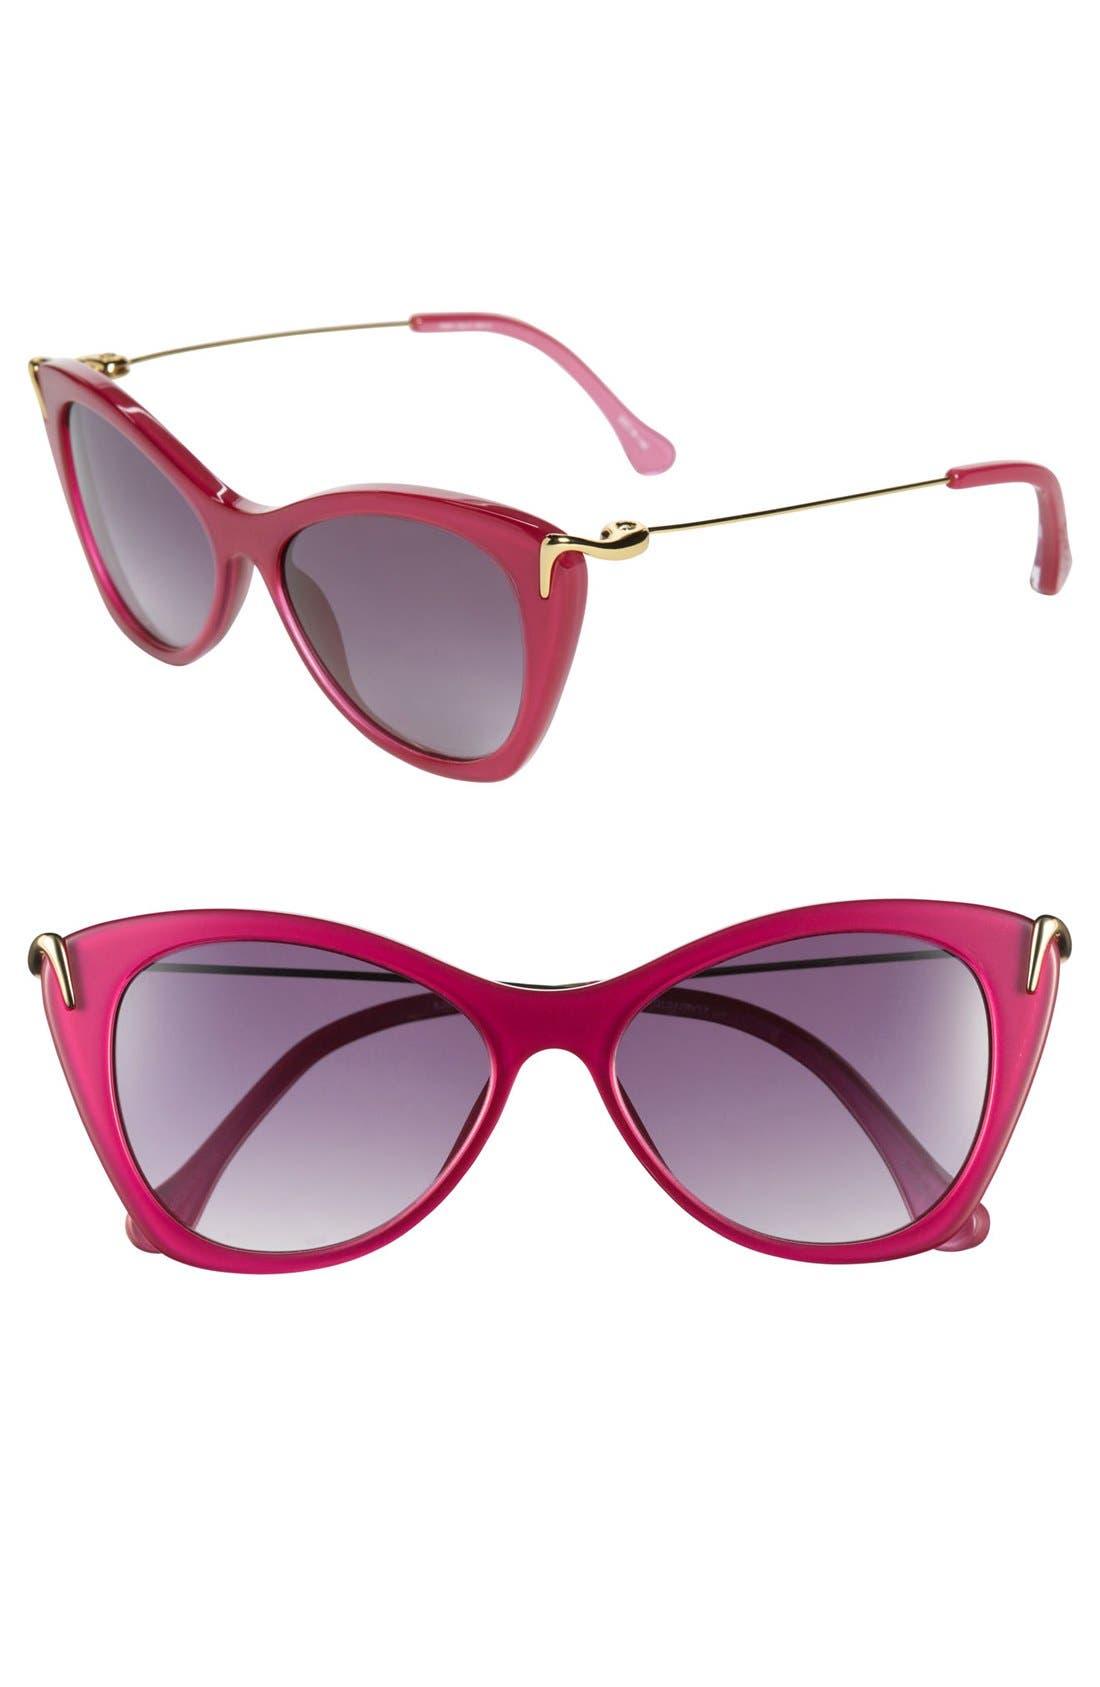 Main Image - Elizabeth and James 'Fillmore' 52mm Cat Eye Sunglasses